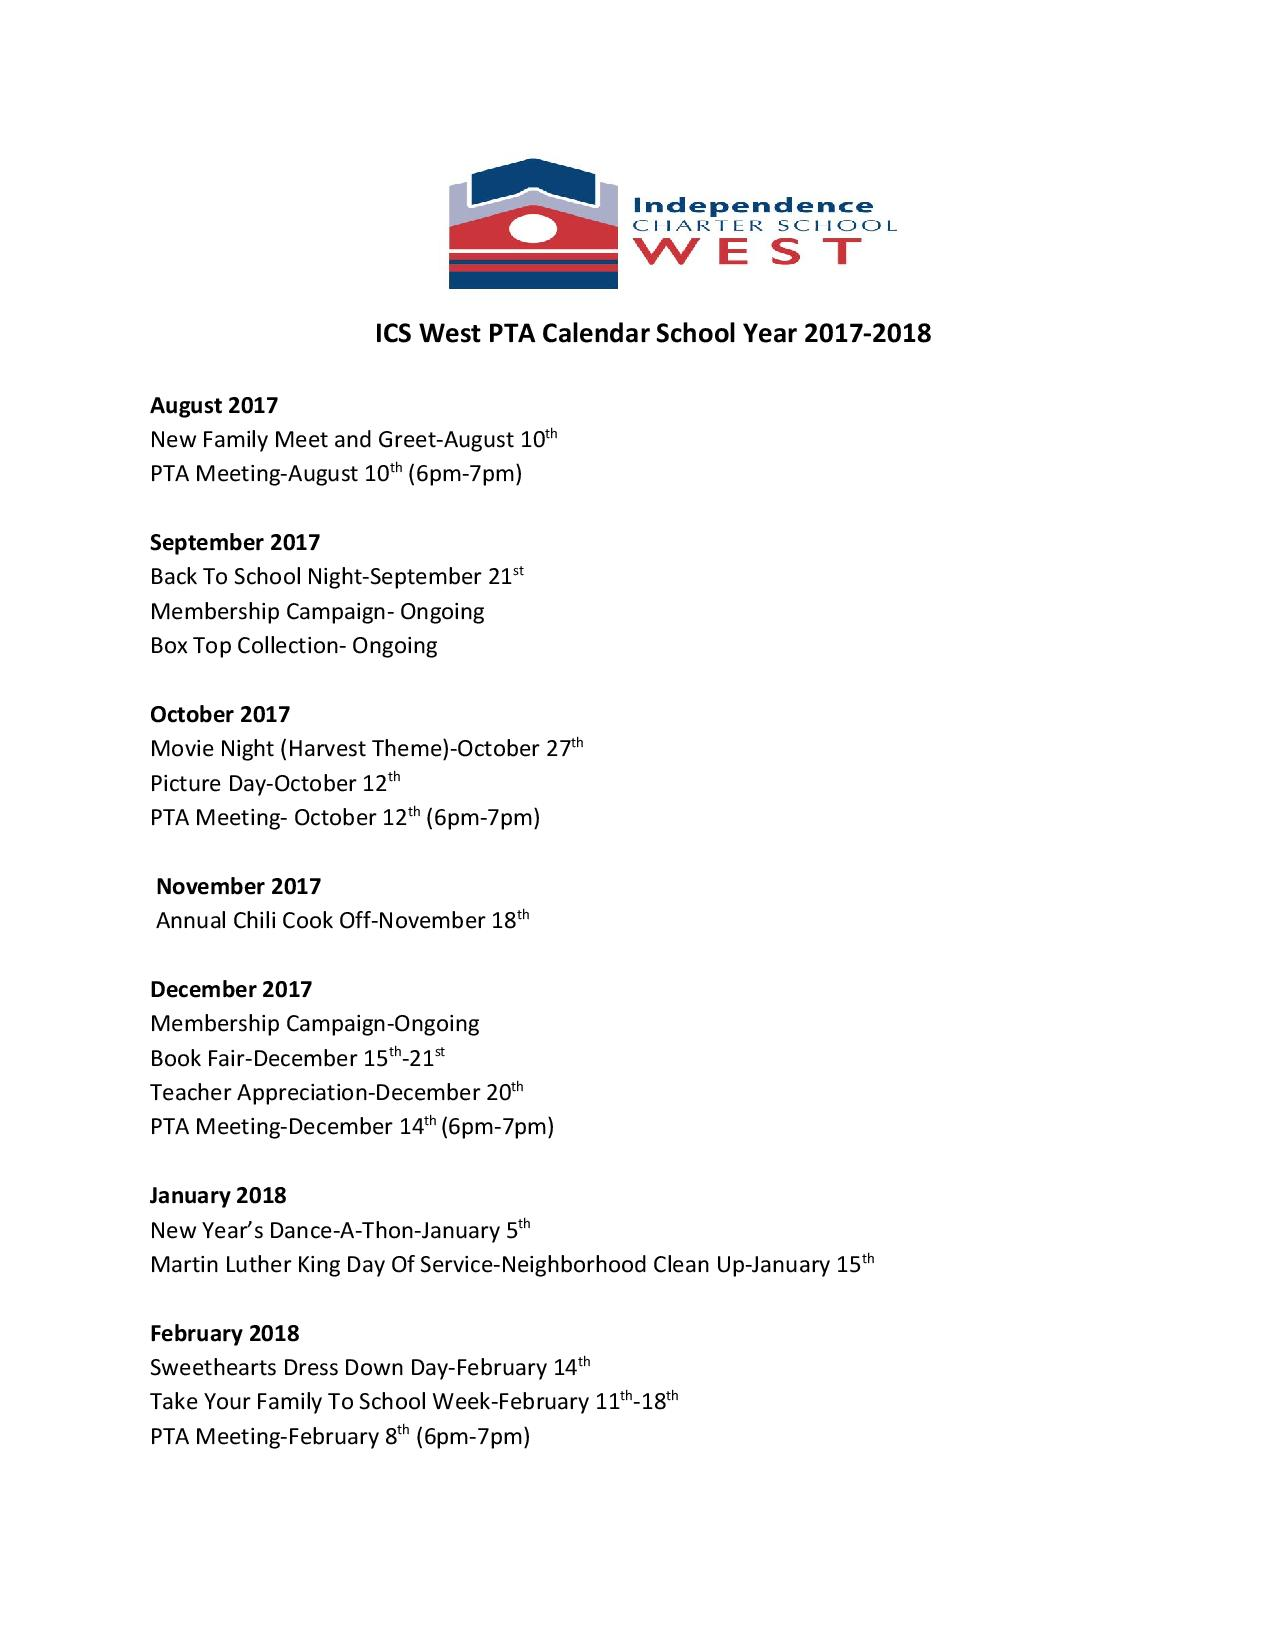 ICS West PTA Calendar School Year 2017-2018.docx-page-001